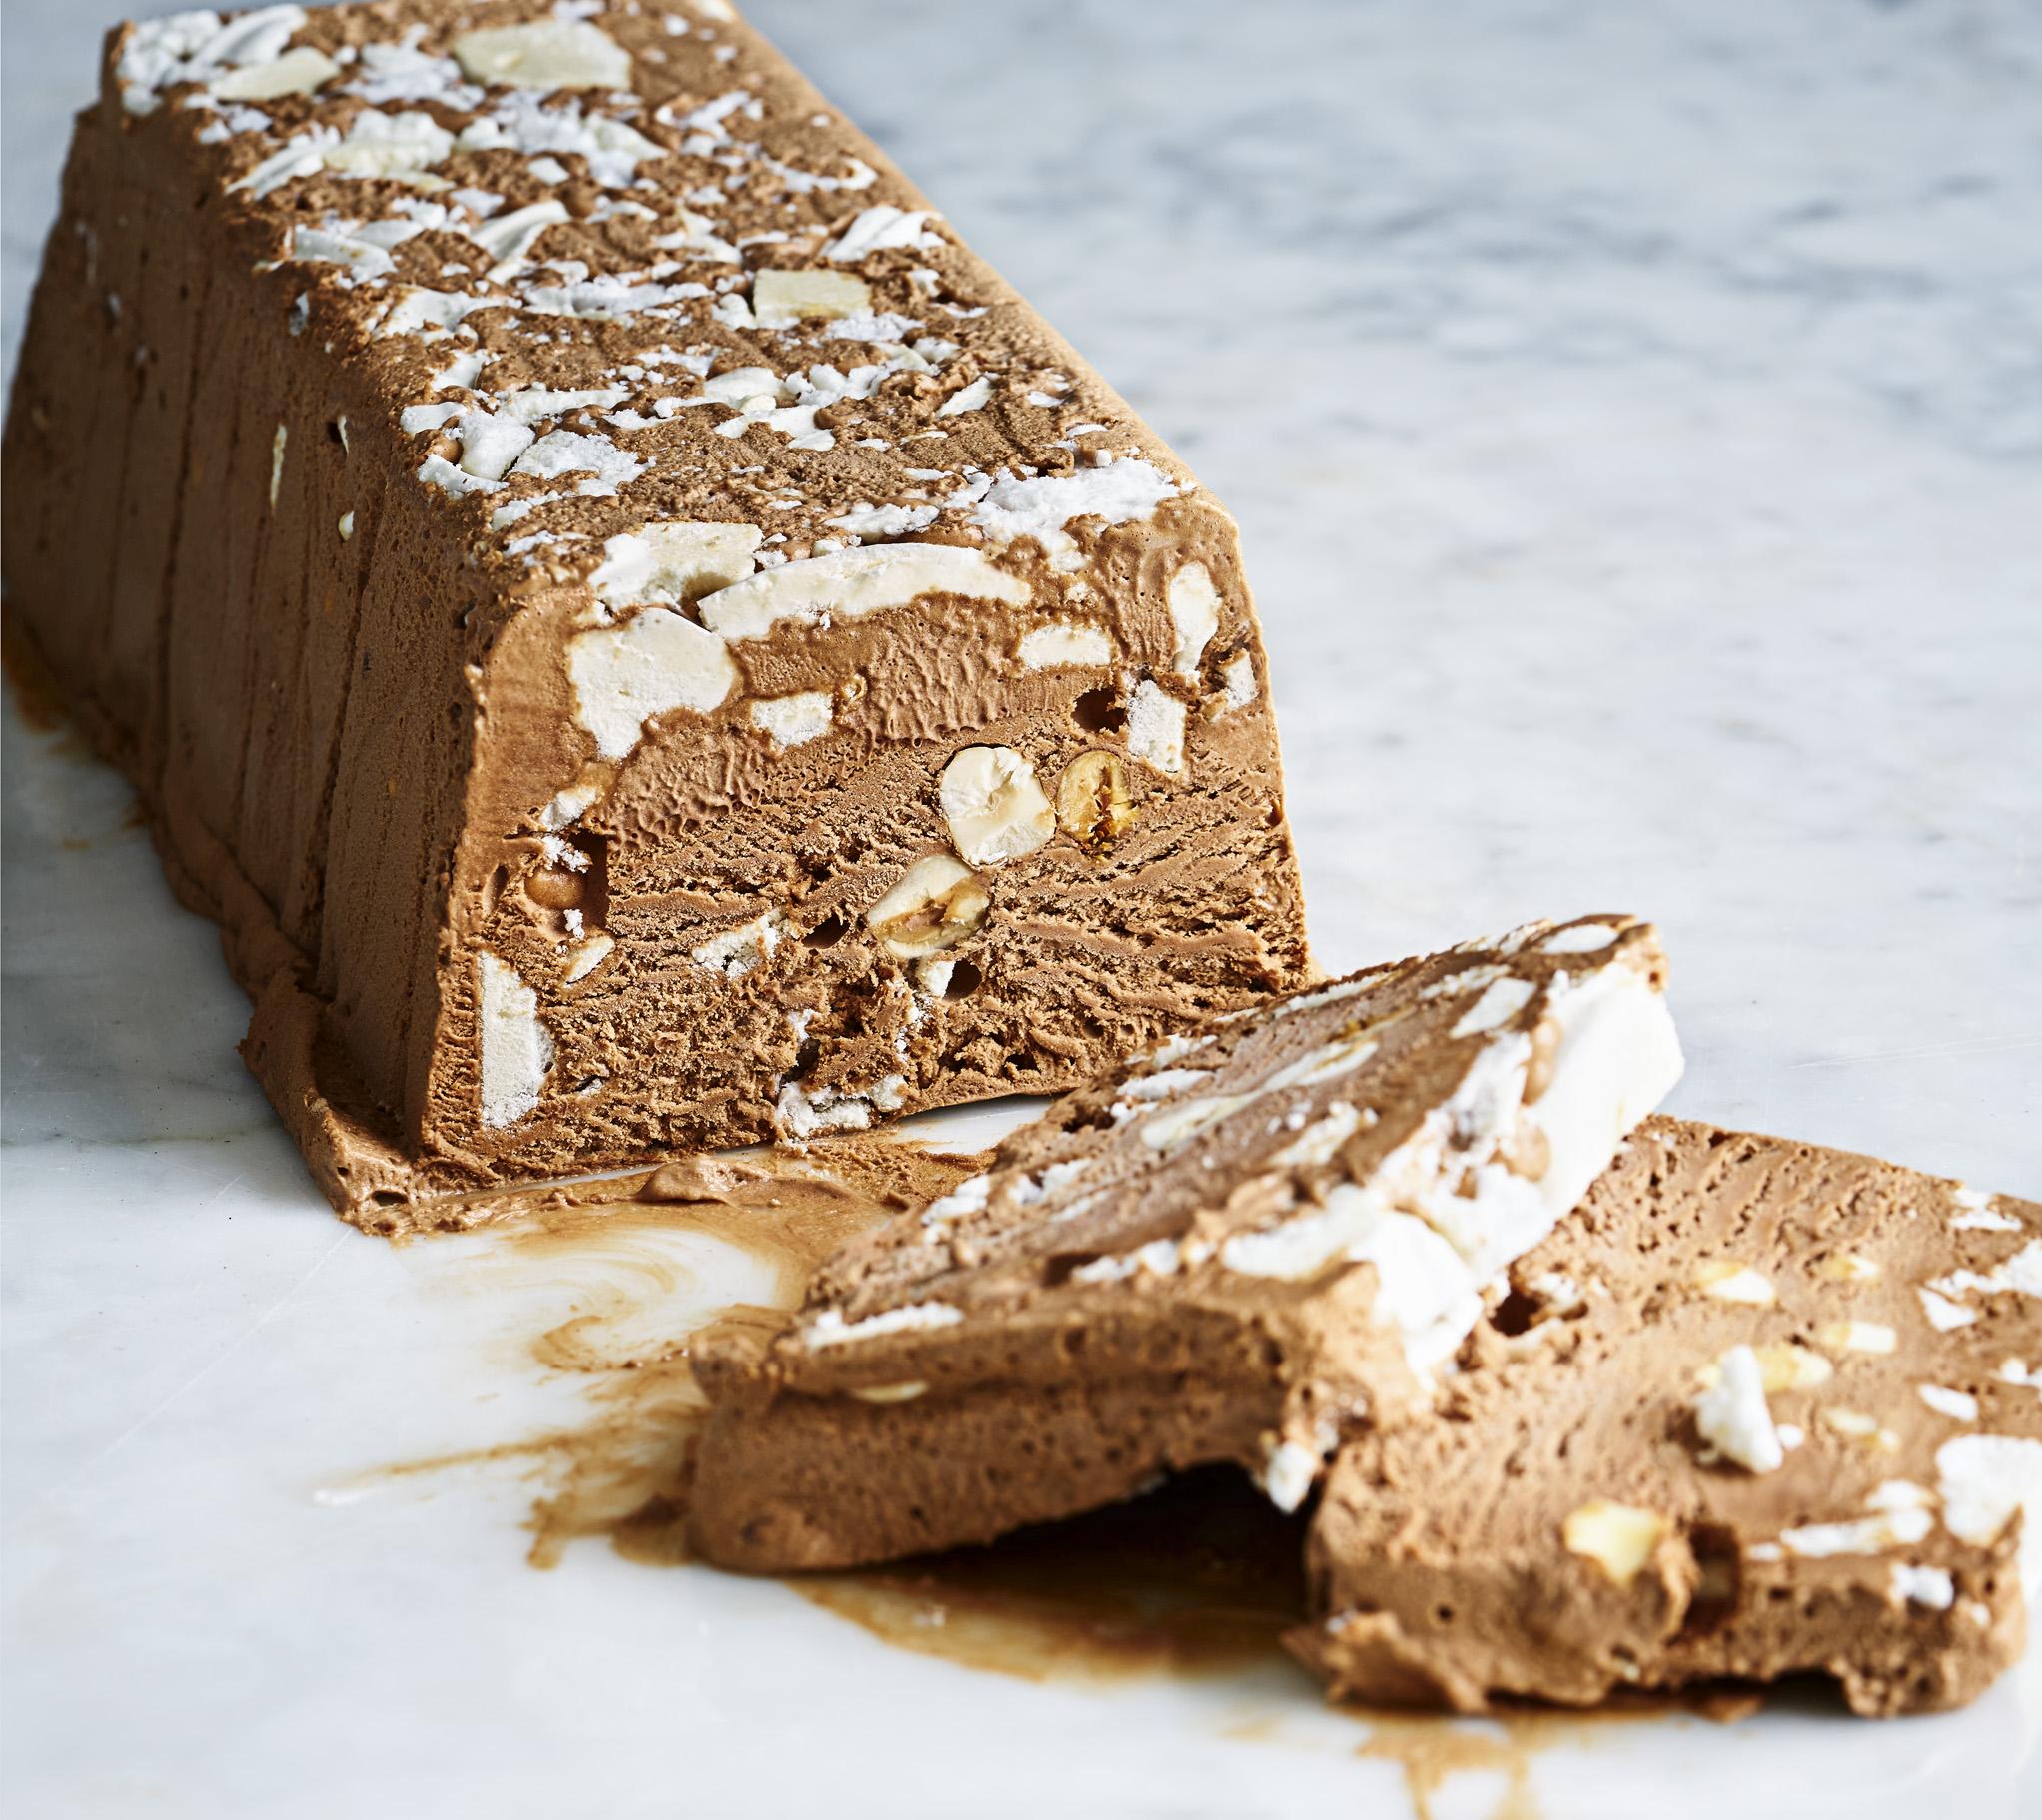 Chocolate and Hazlenut Meringue Semifreddo